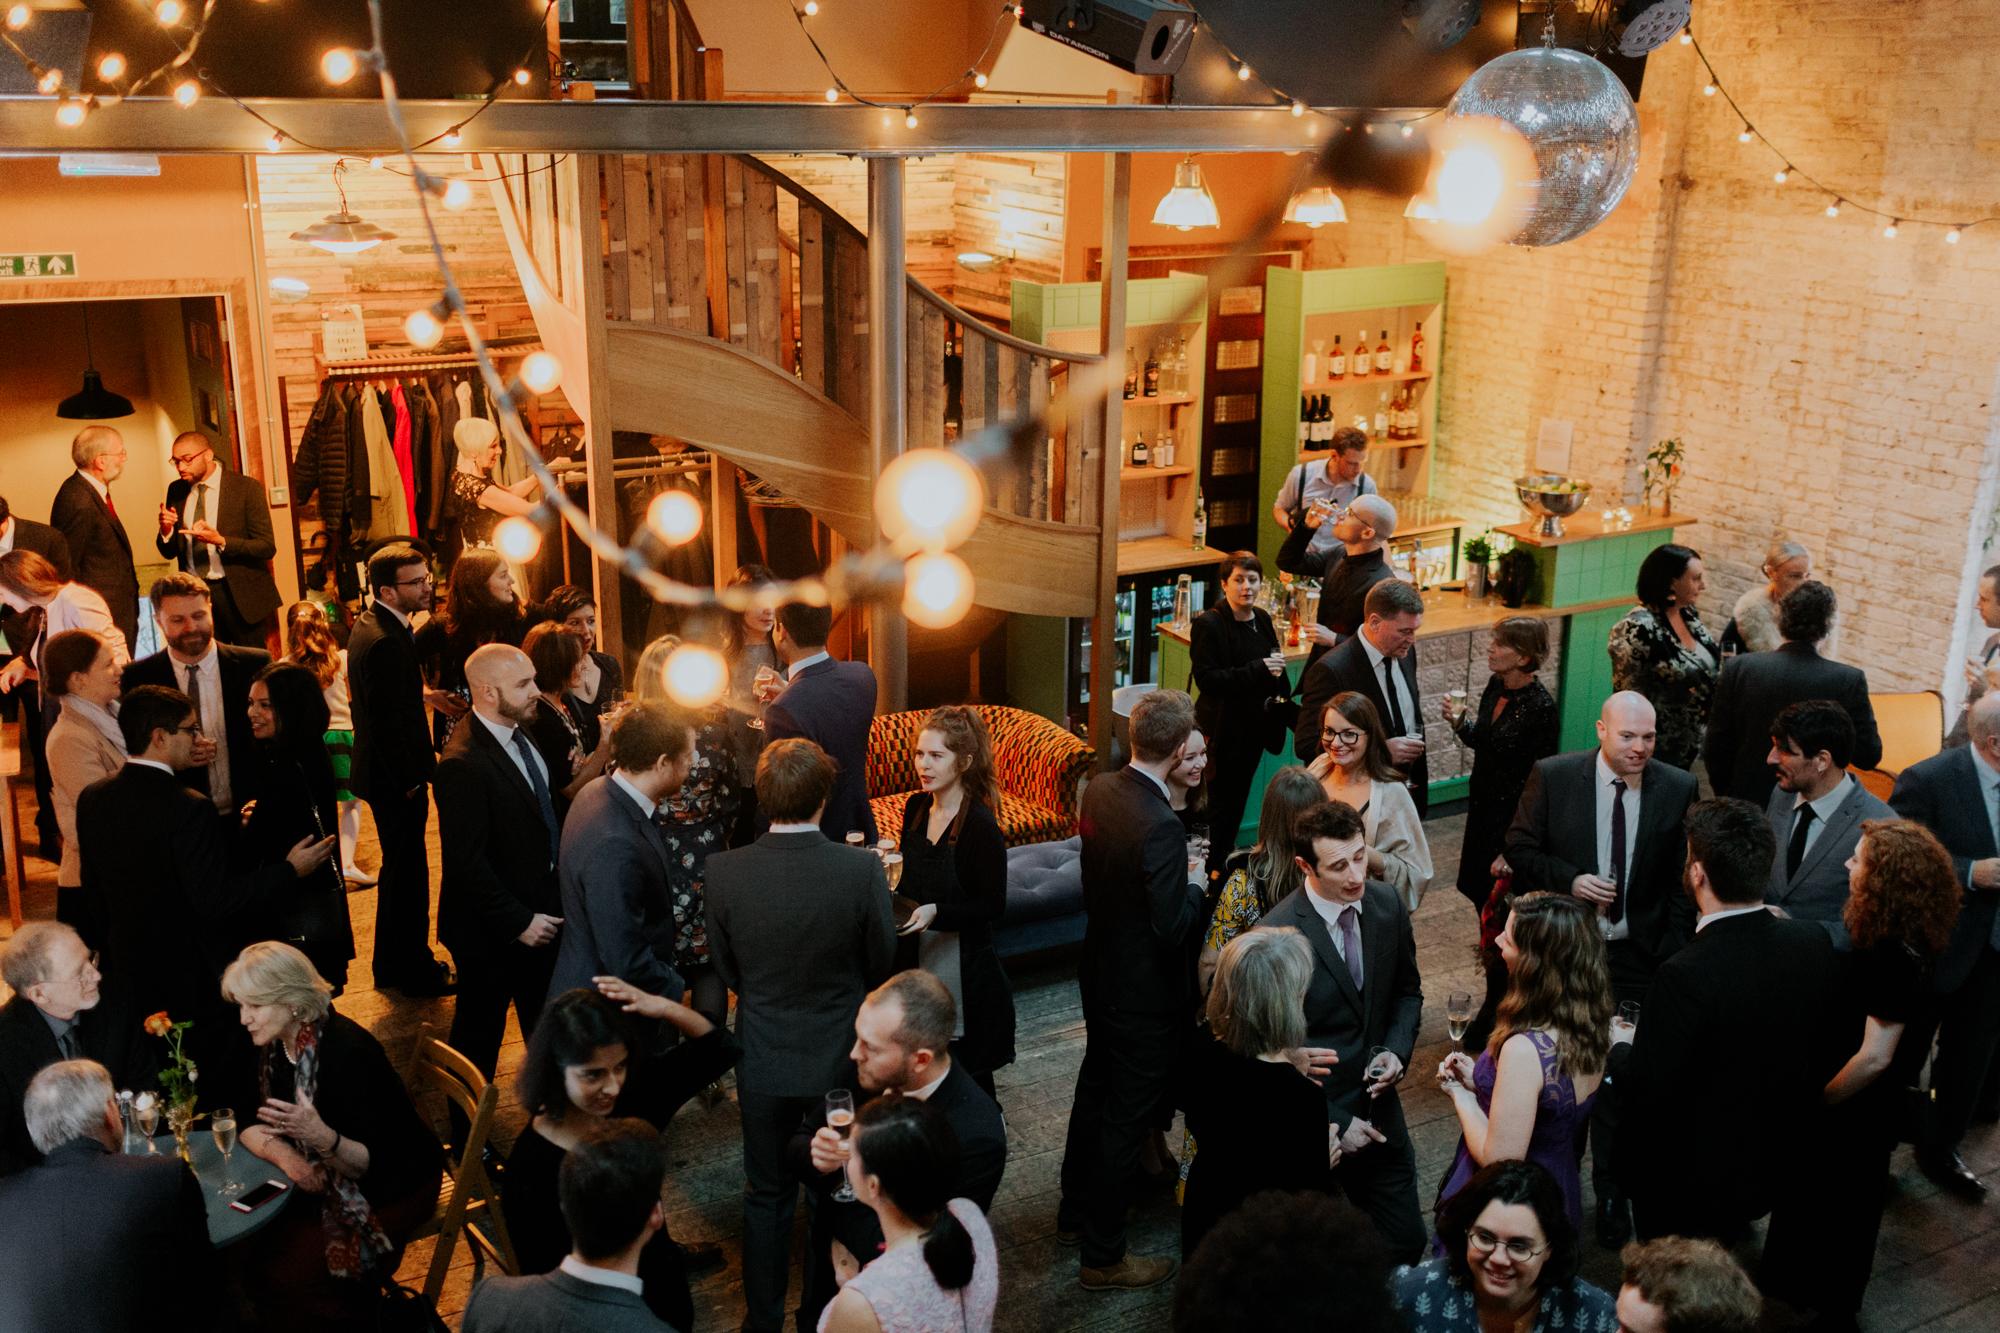 Quirky Venue, Non-traditional wedding planner, London Wedding coordination, Event Bar, Bespoke weddings, Event team, Brixton East 1871 Wedding, Streetfood wedding, informal, Stylish, Worm London